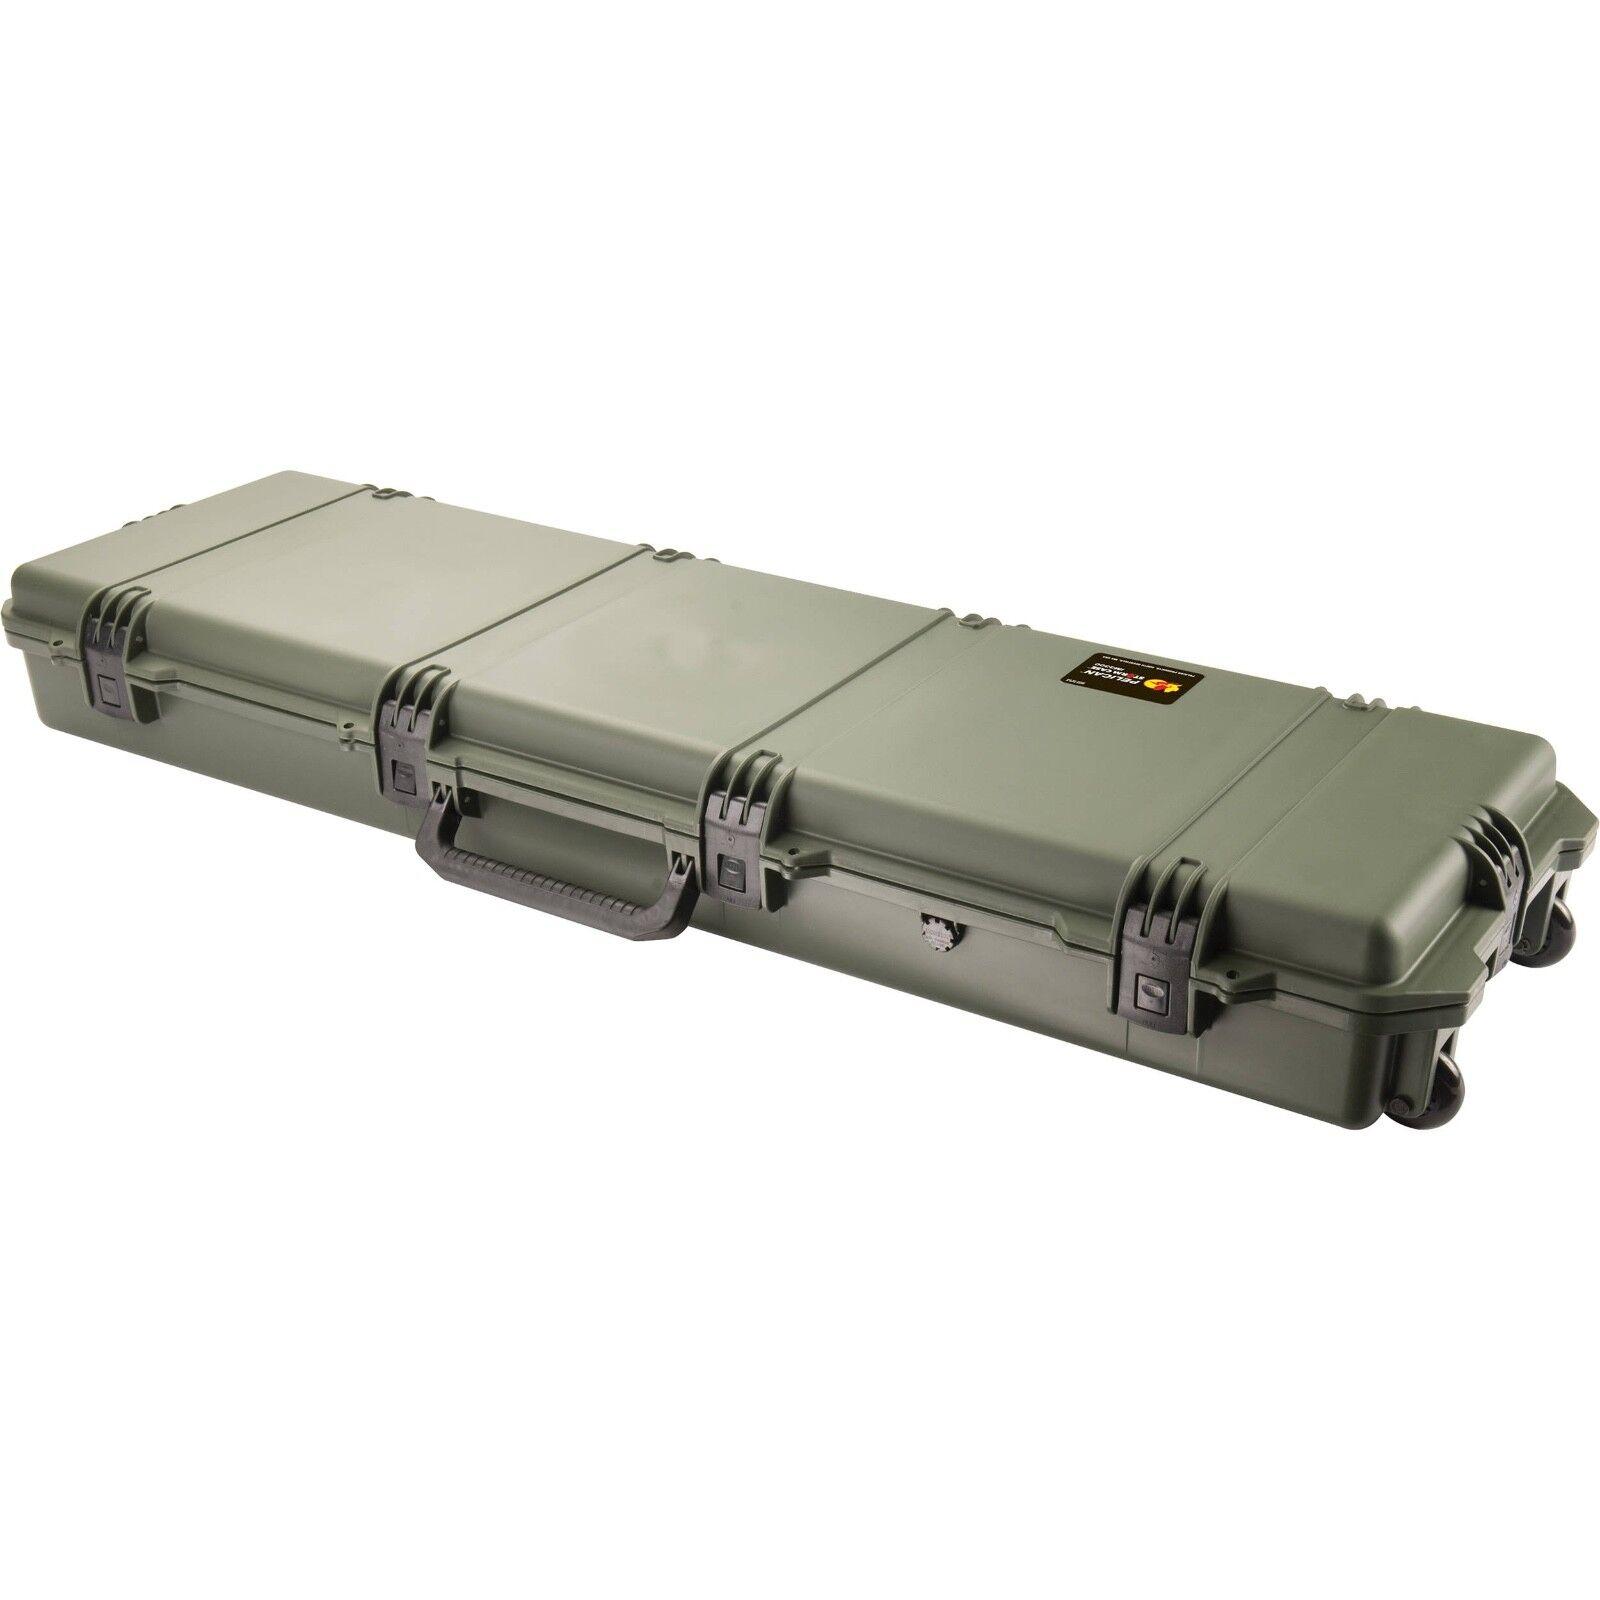 Peli Storm iM3300 Case Olive With Foam